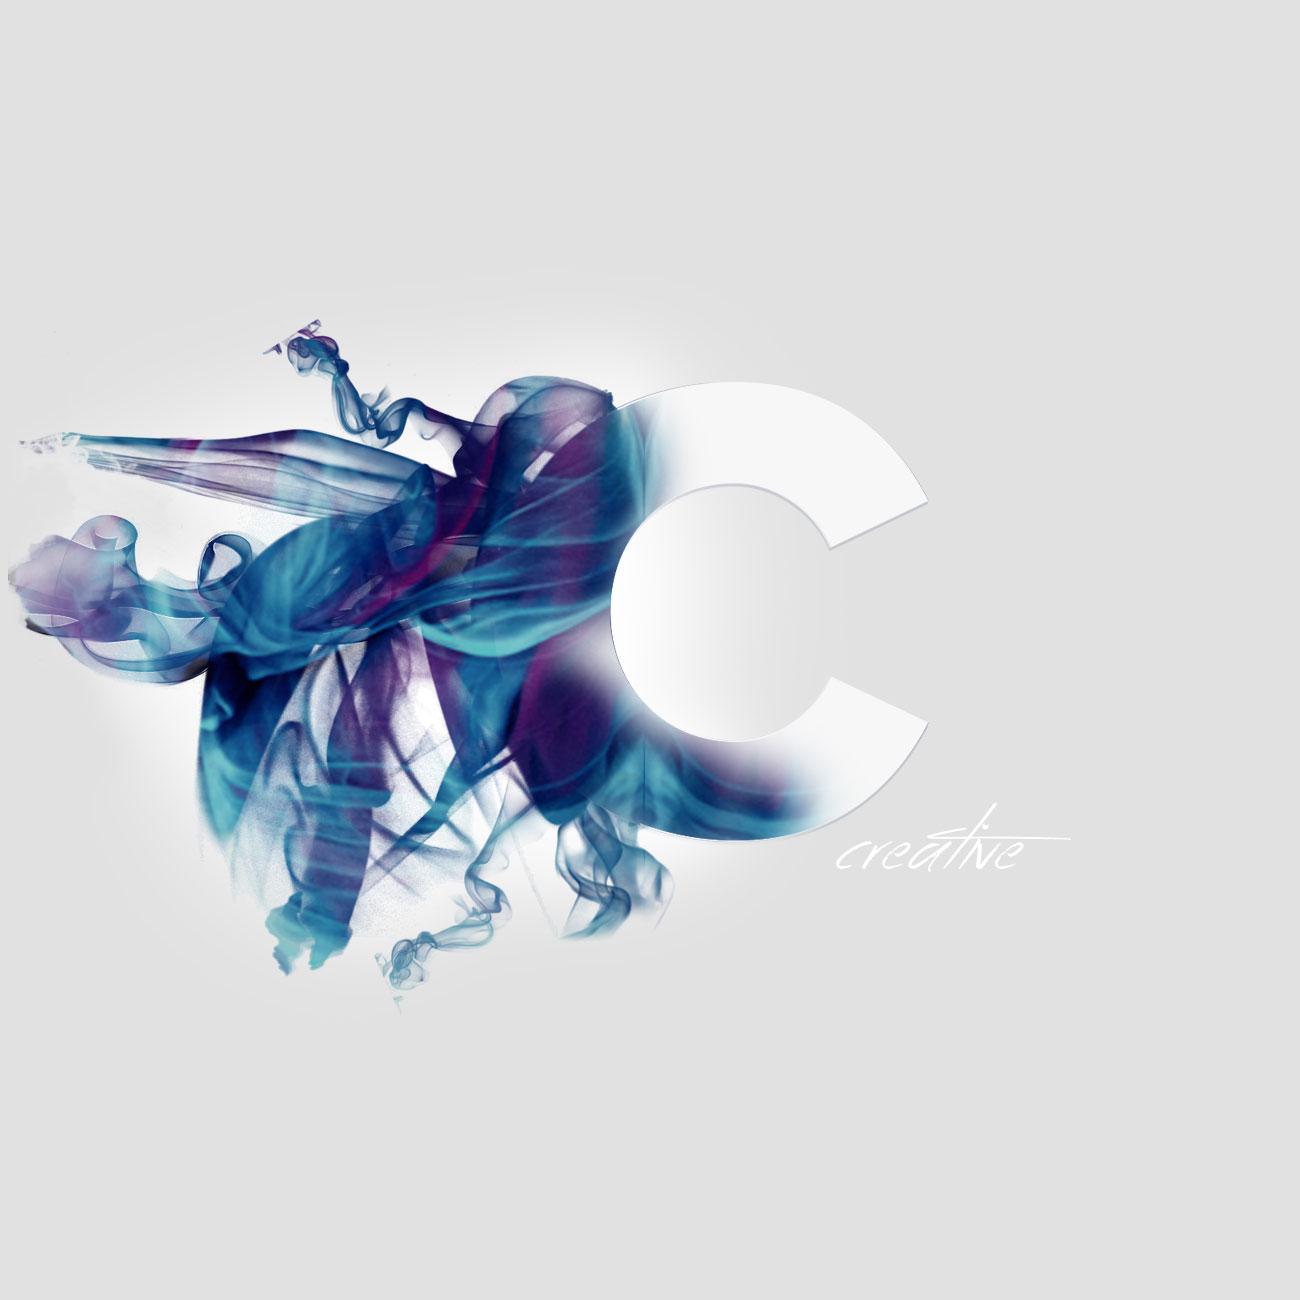 """Creative"" - website banner design"